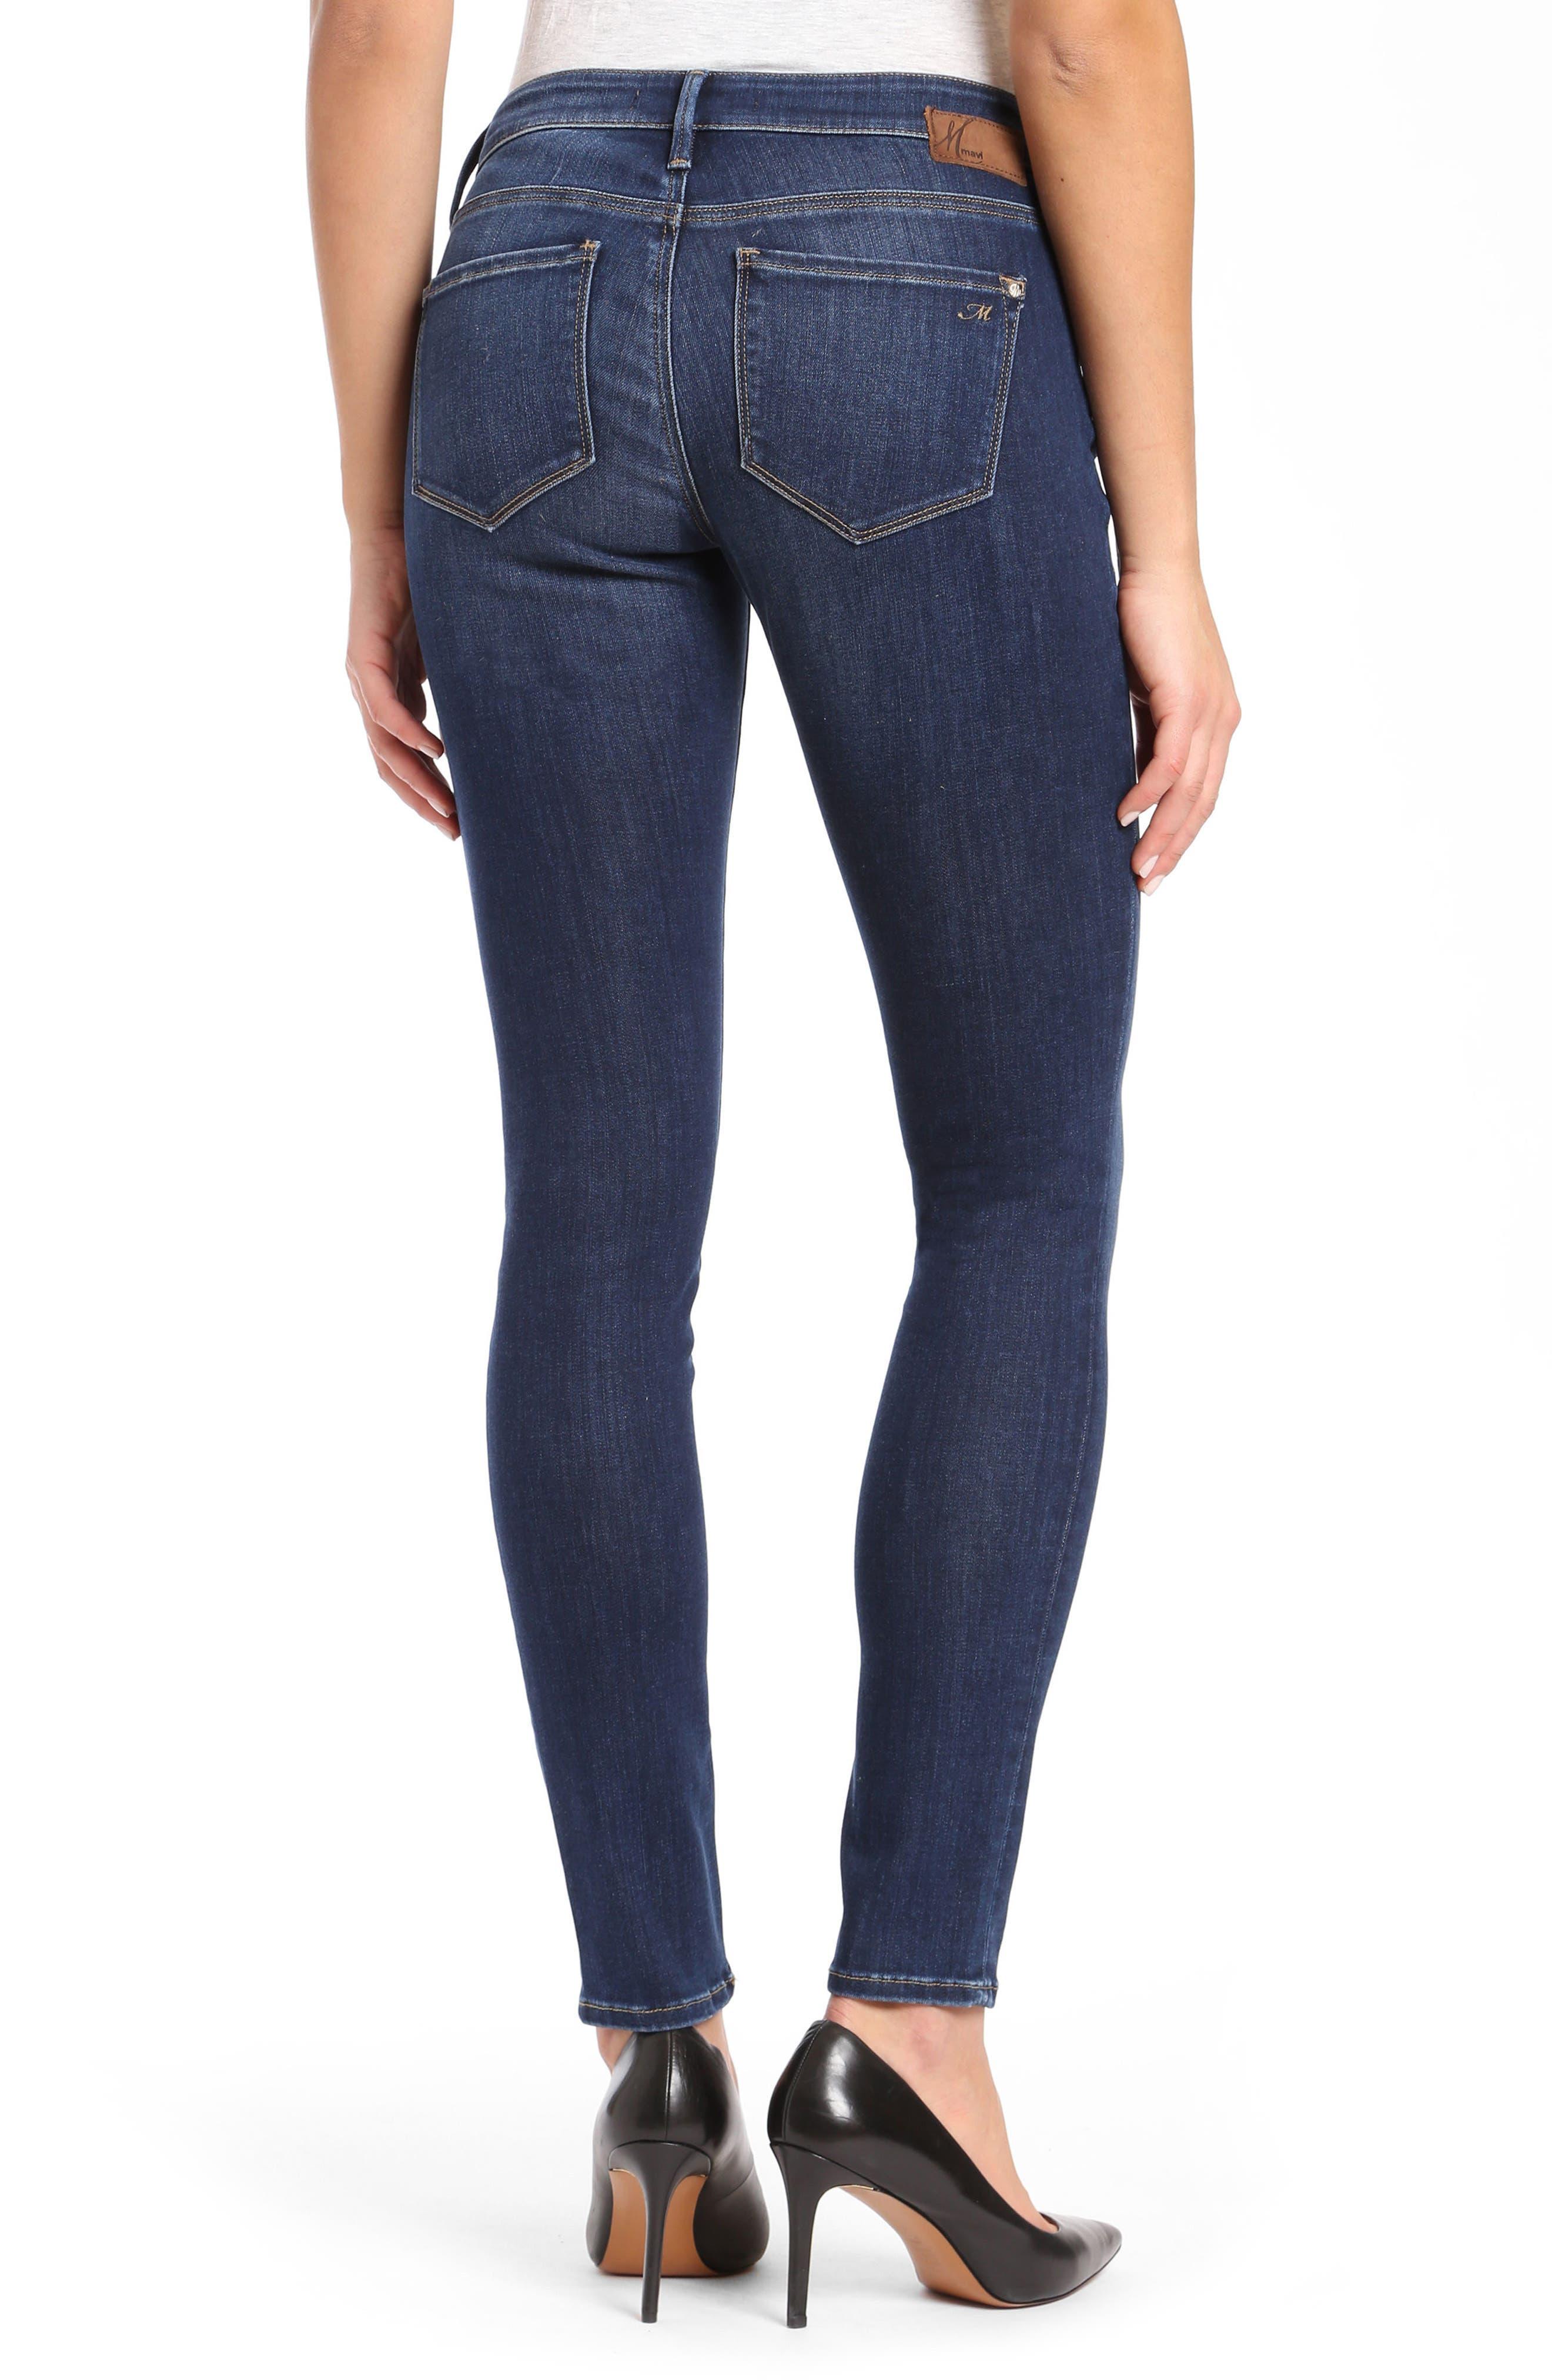 Alexa Supersoft Skinny Jeans,                             Alternate thumbnail 2, color,                             DARK SUPER SOFT